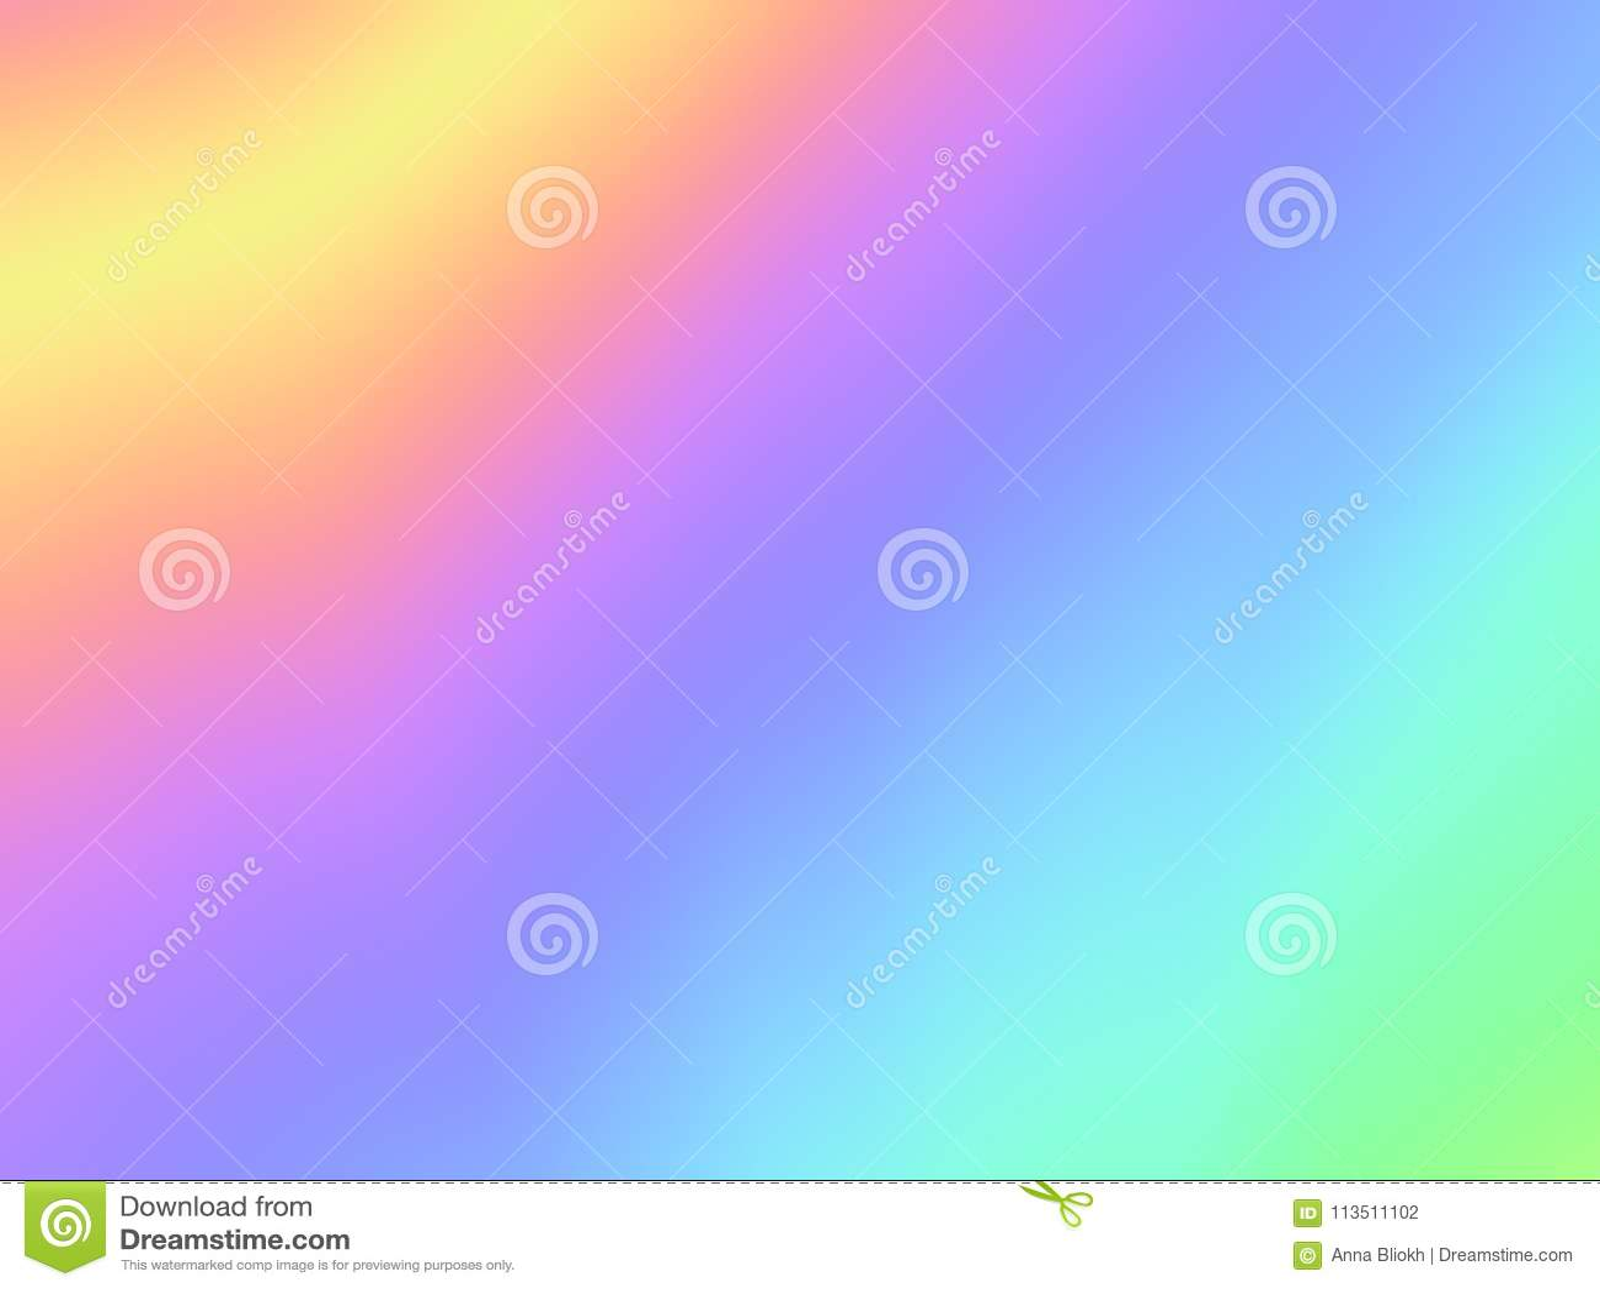 Pastel Summer Neon Gradient: Holographic Foil Background Multi Color Gradient Blurry